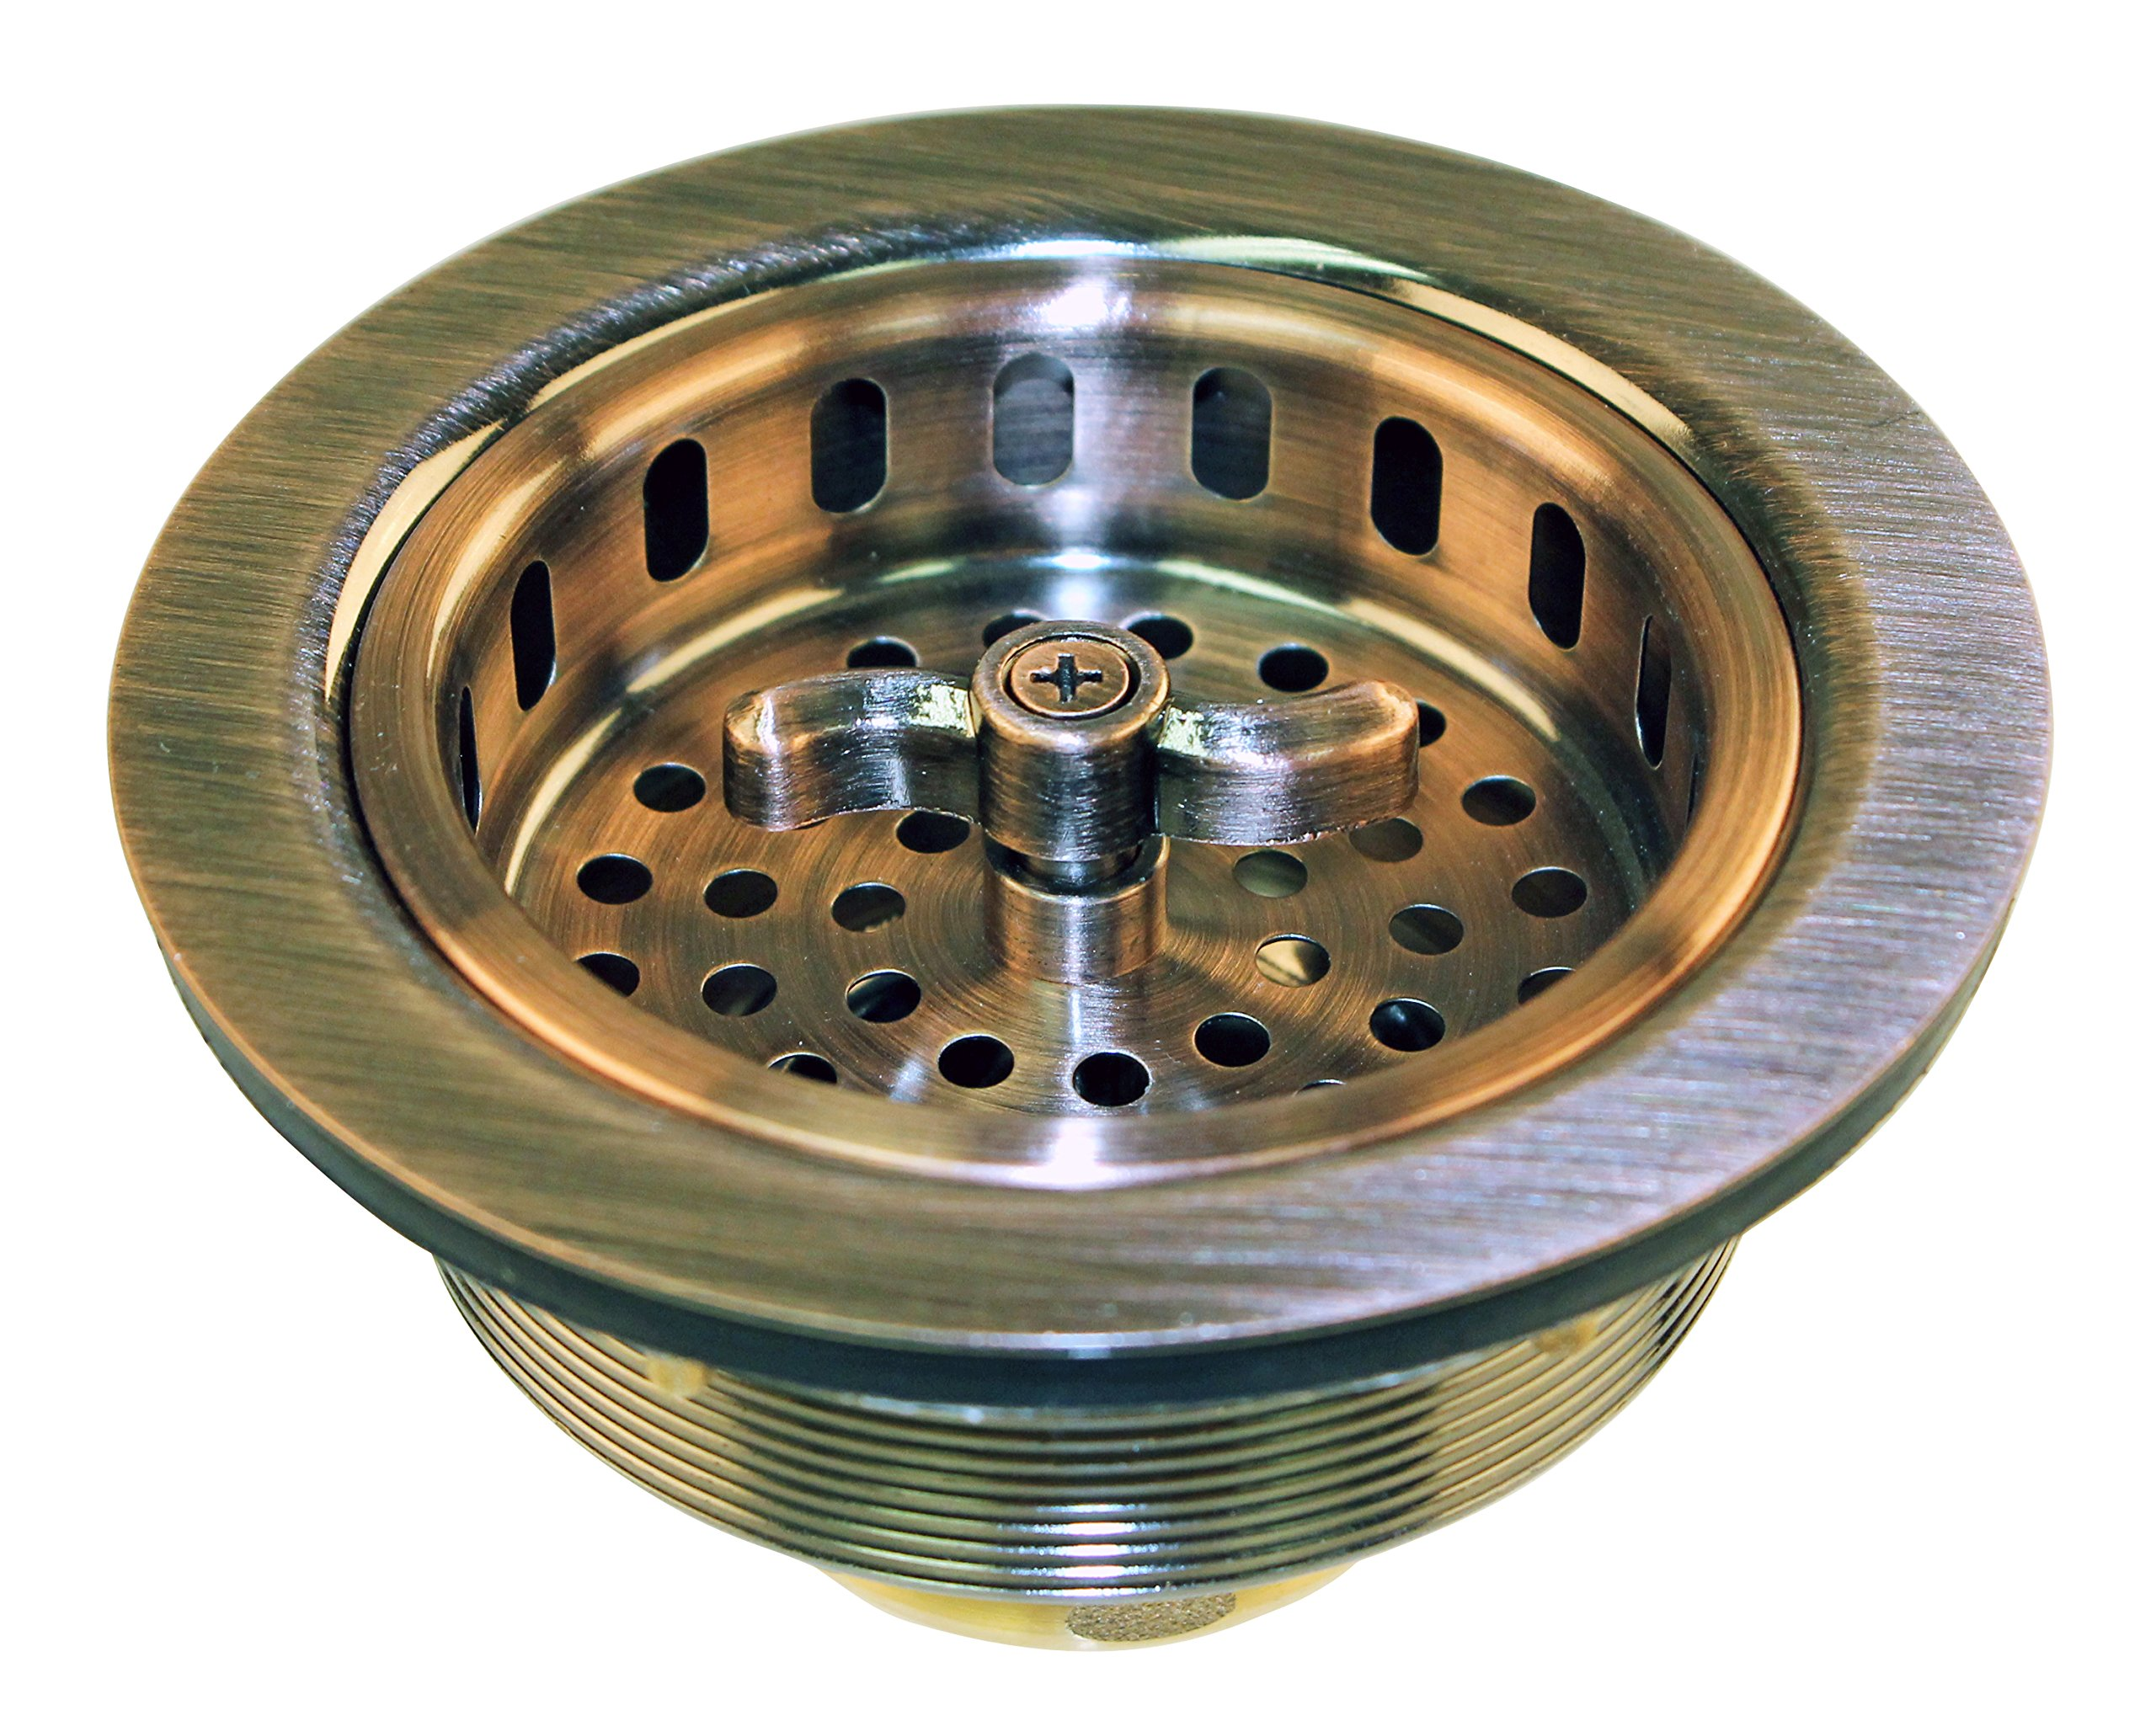 Westbrass Wing Nut Style Large Kitchen Sink Basket Strainer, Antique Copper, D213-11